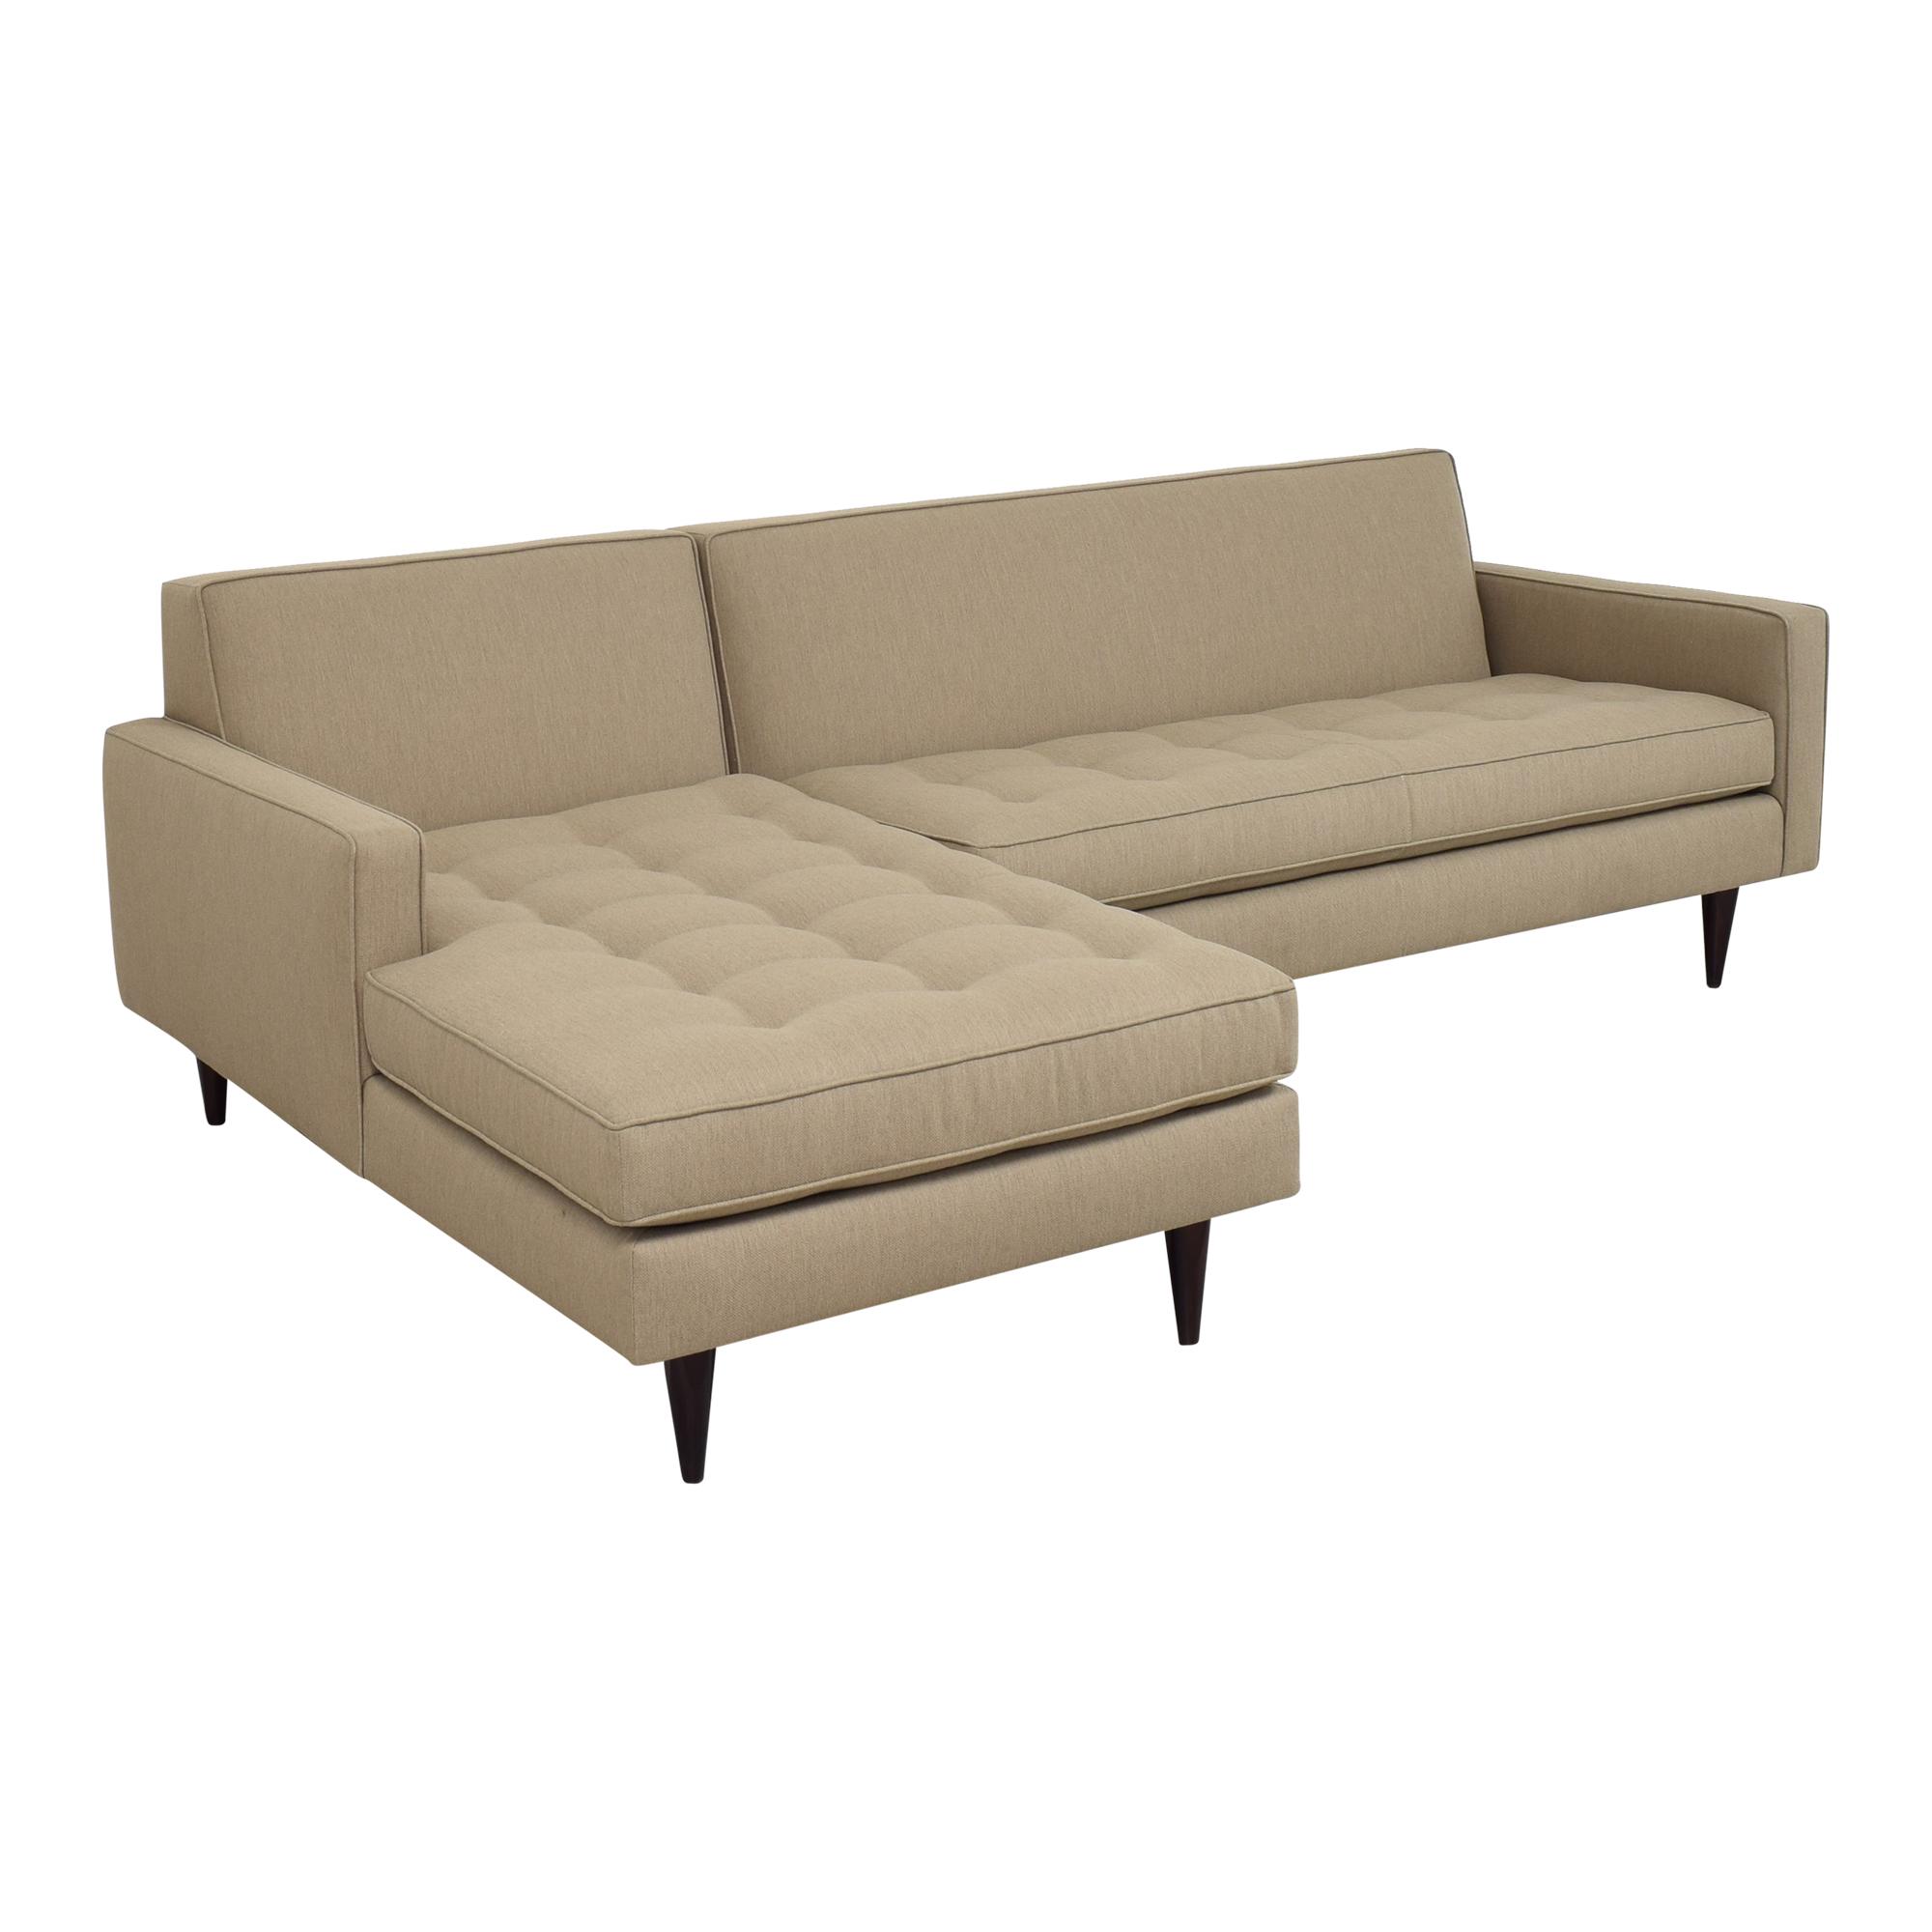 Room & Board Room & Board Reese Sectional Sofa used